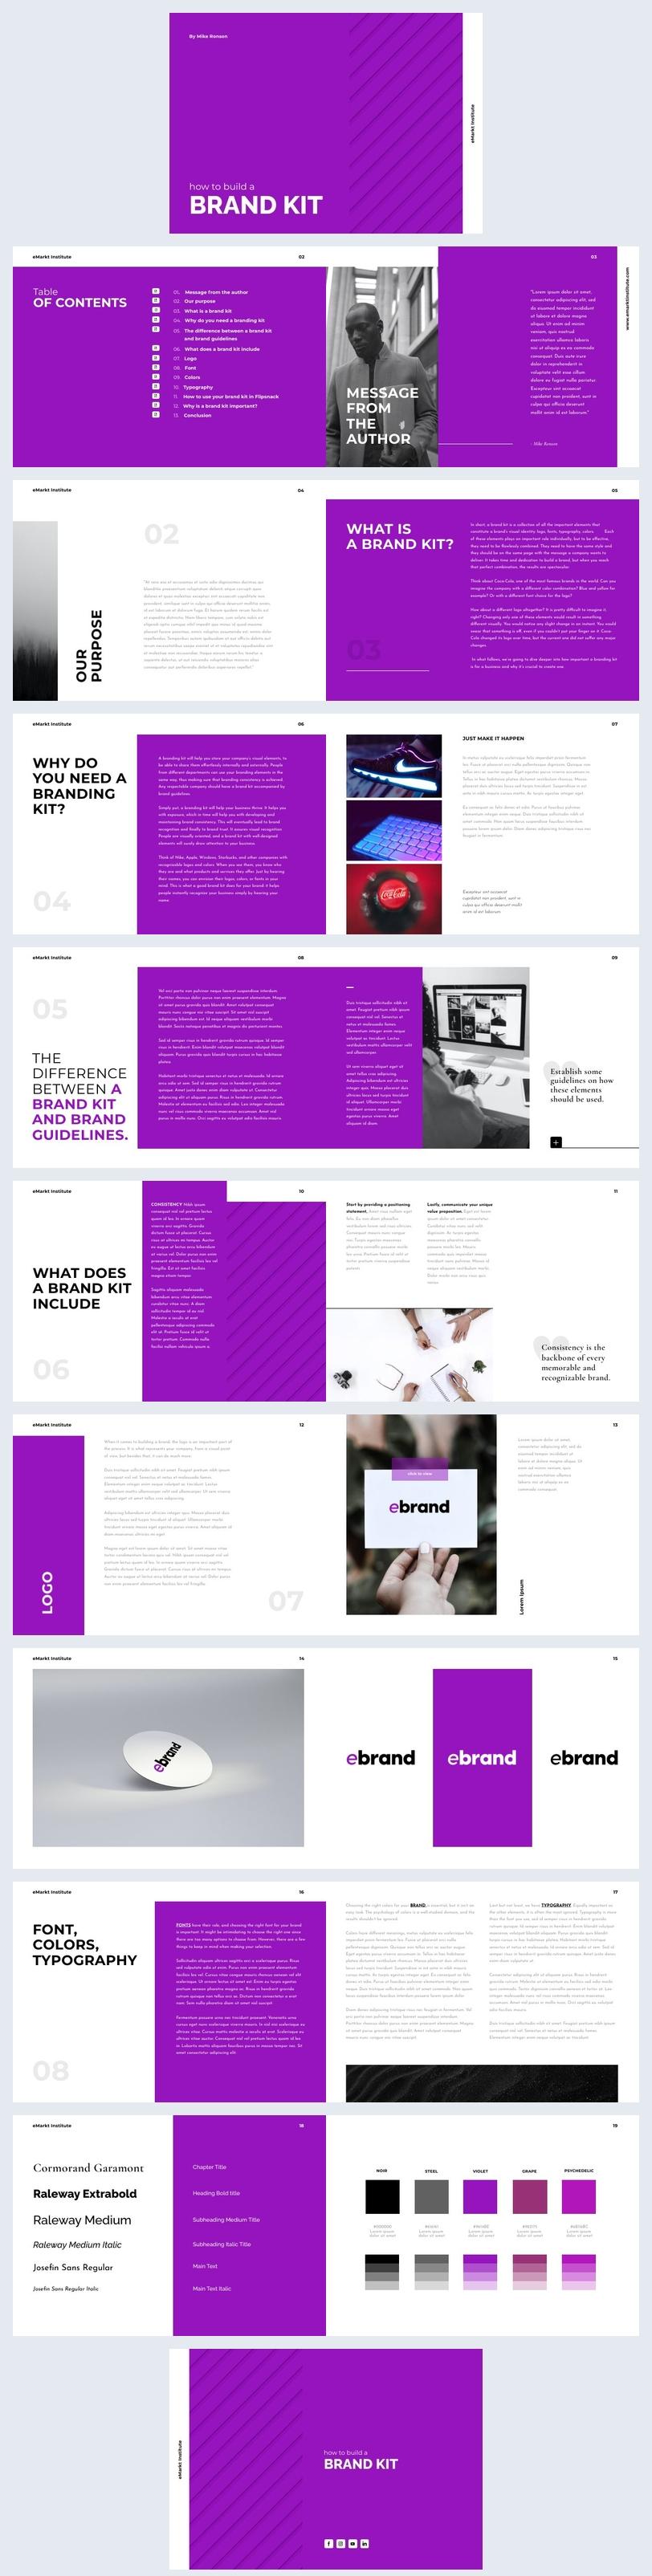 Free Digital Brand Kit Ebook Design Idea